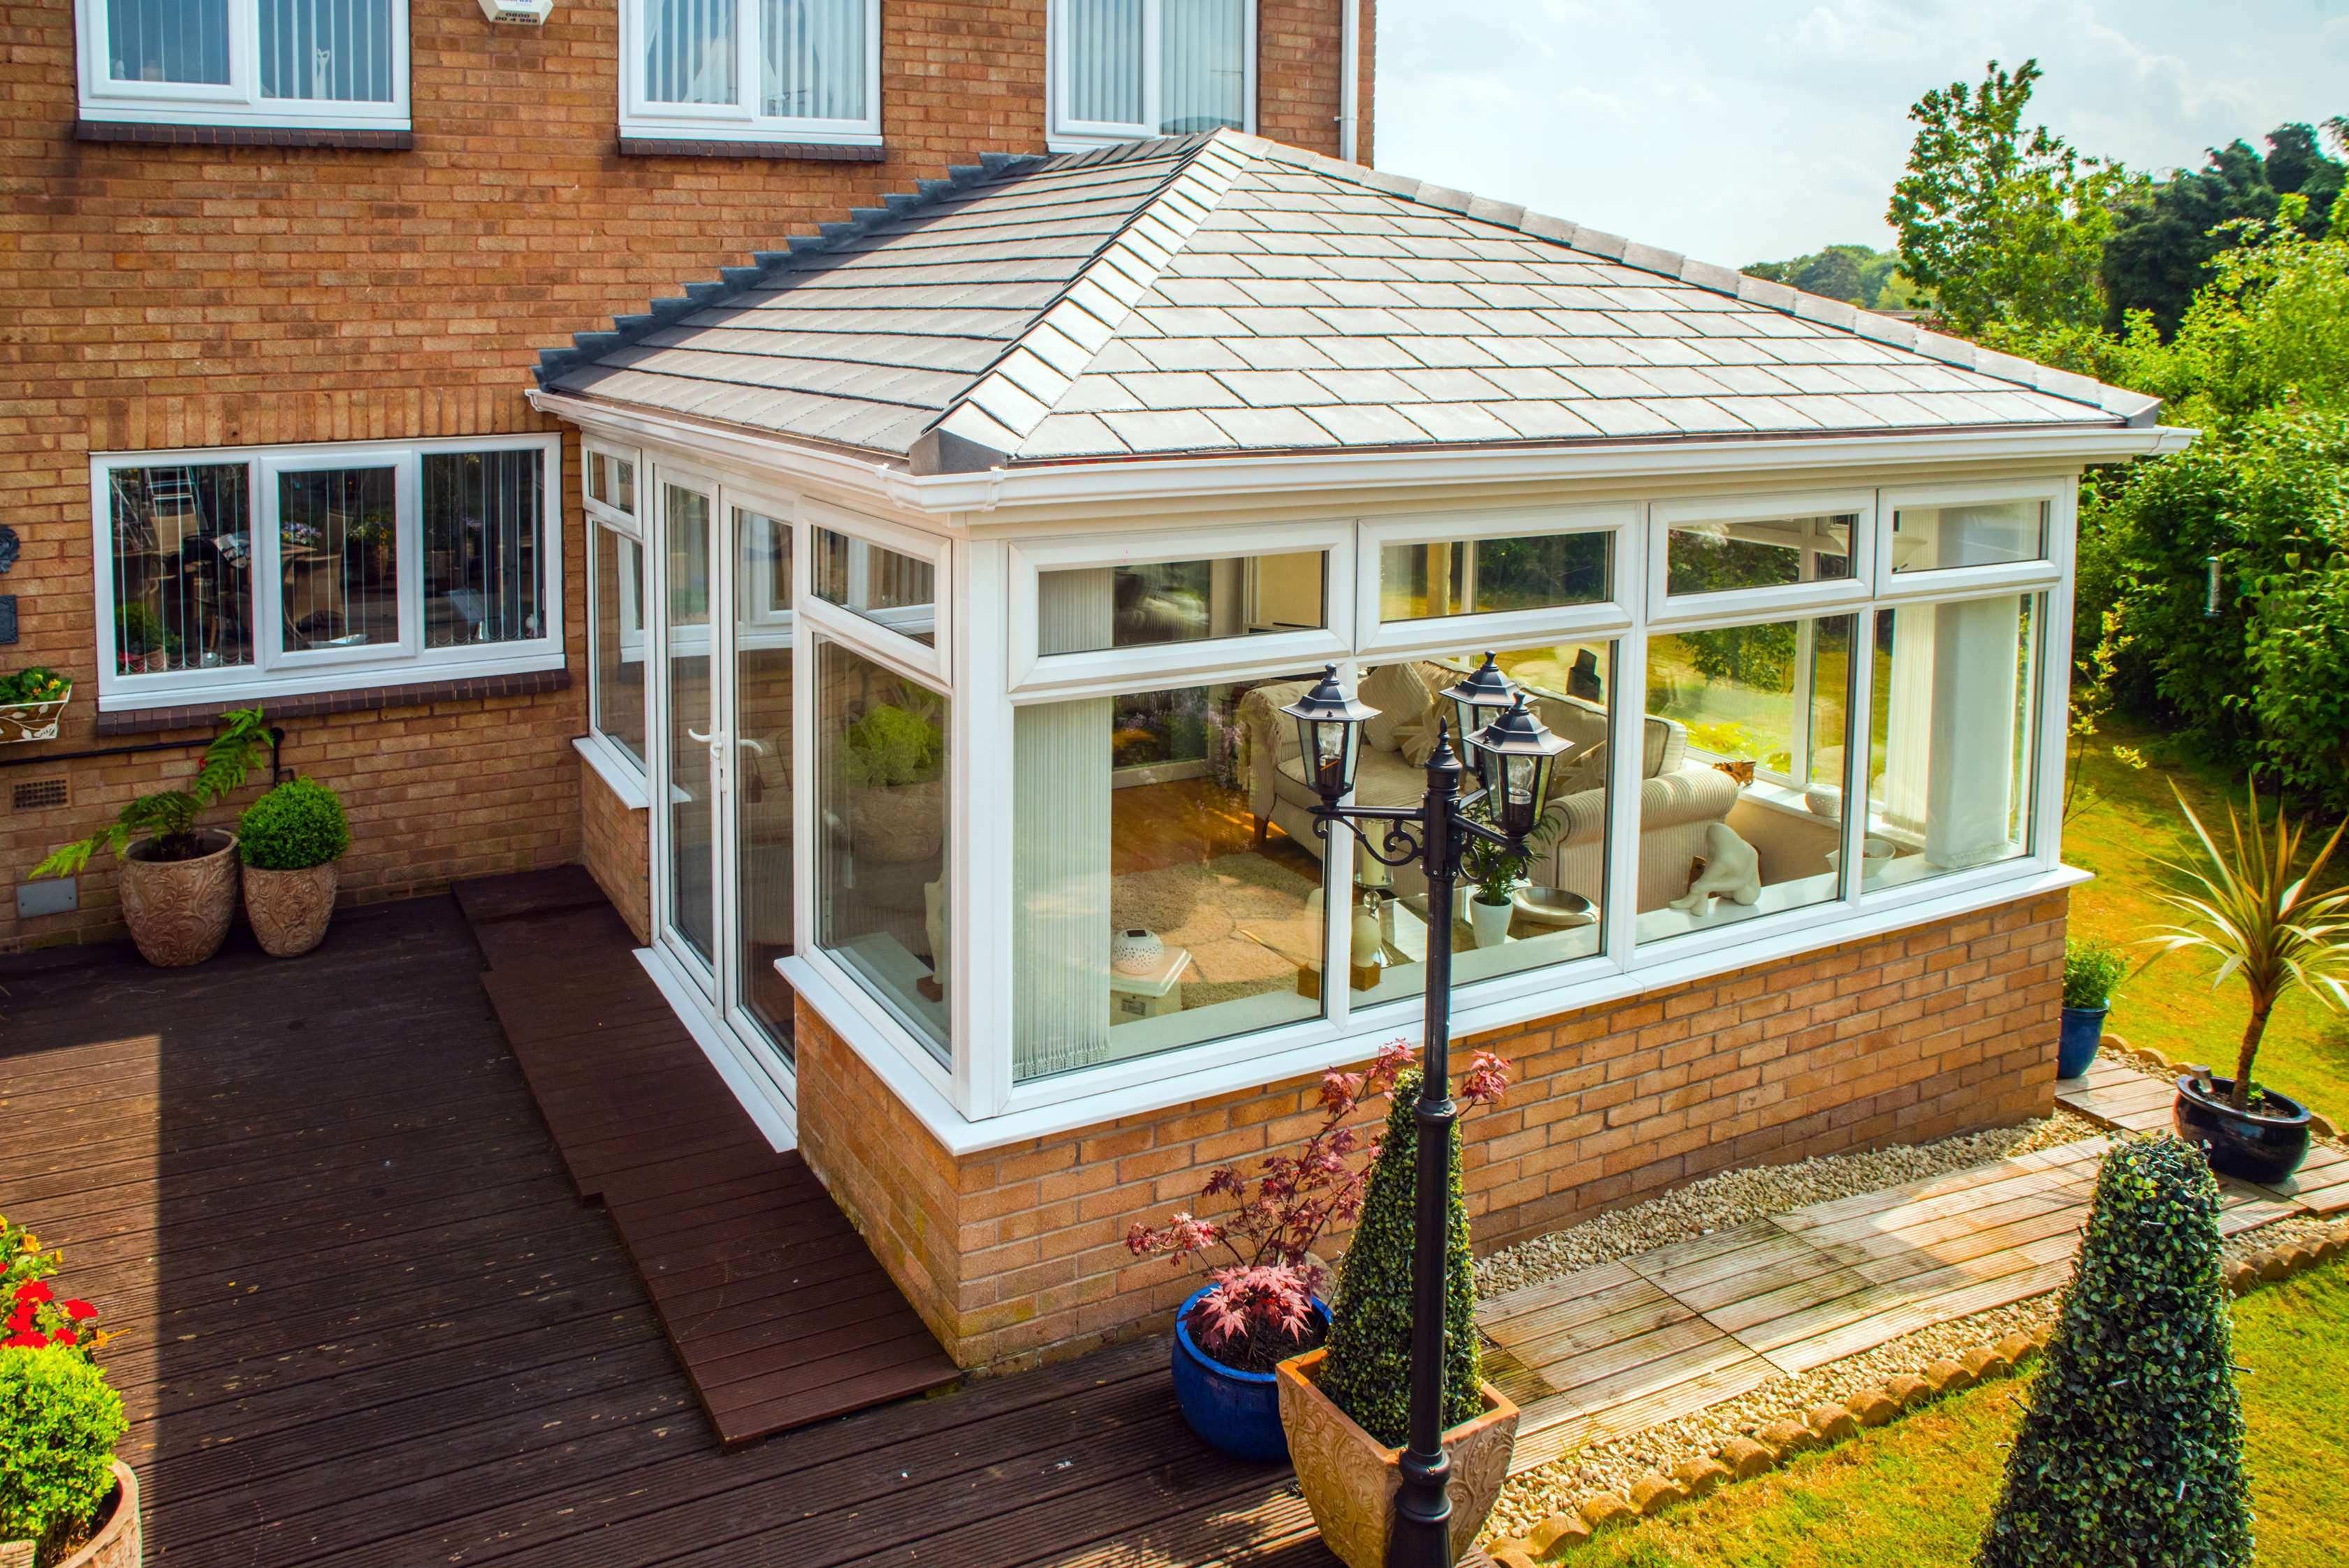 Tiled Conservatory Roof Conservatory Roof Tiled Conservatory Roof Glass Conservatory Roof